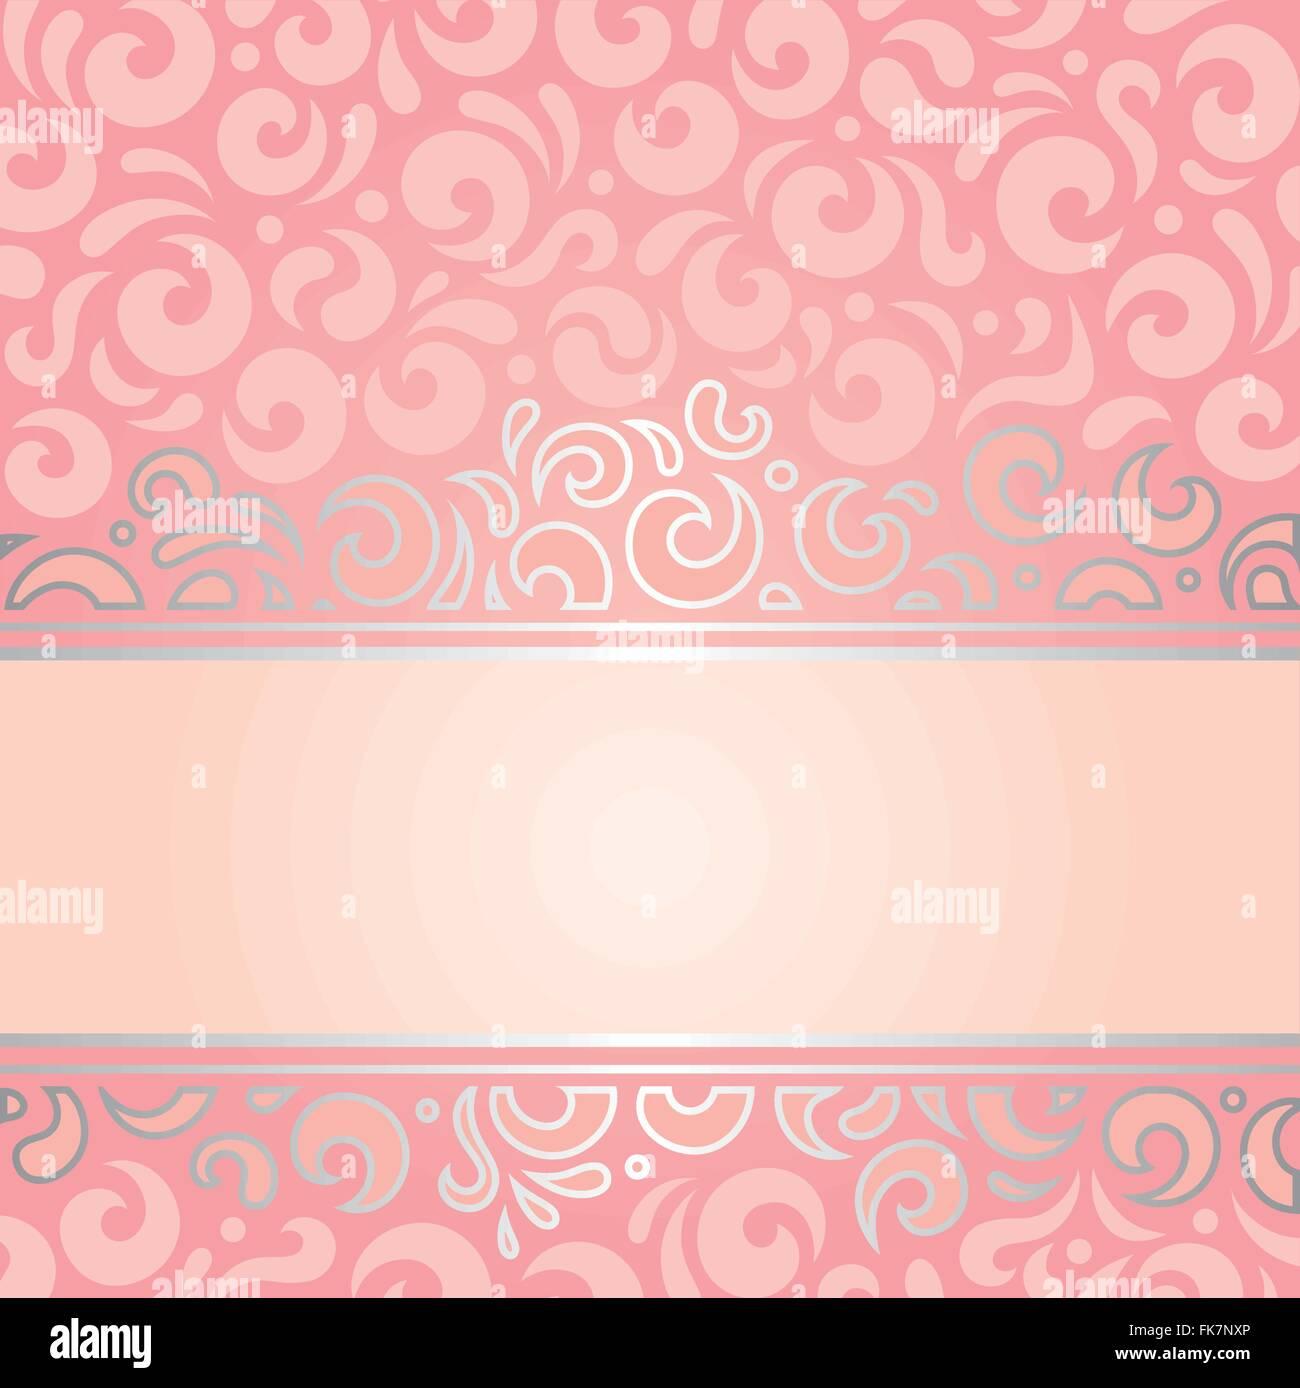 retro decorative pink & silver invitation background vintage stock